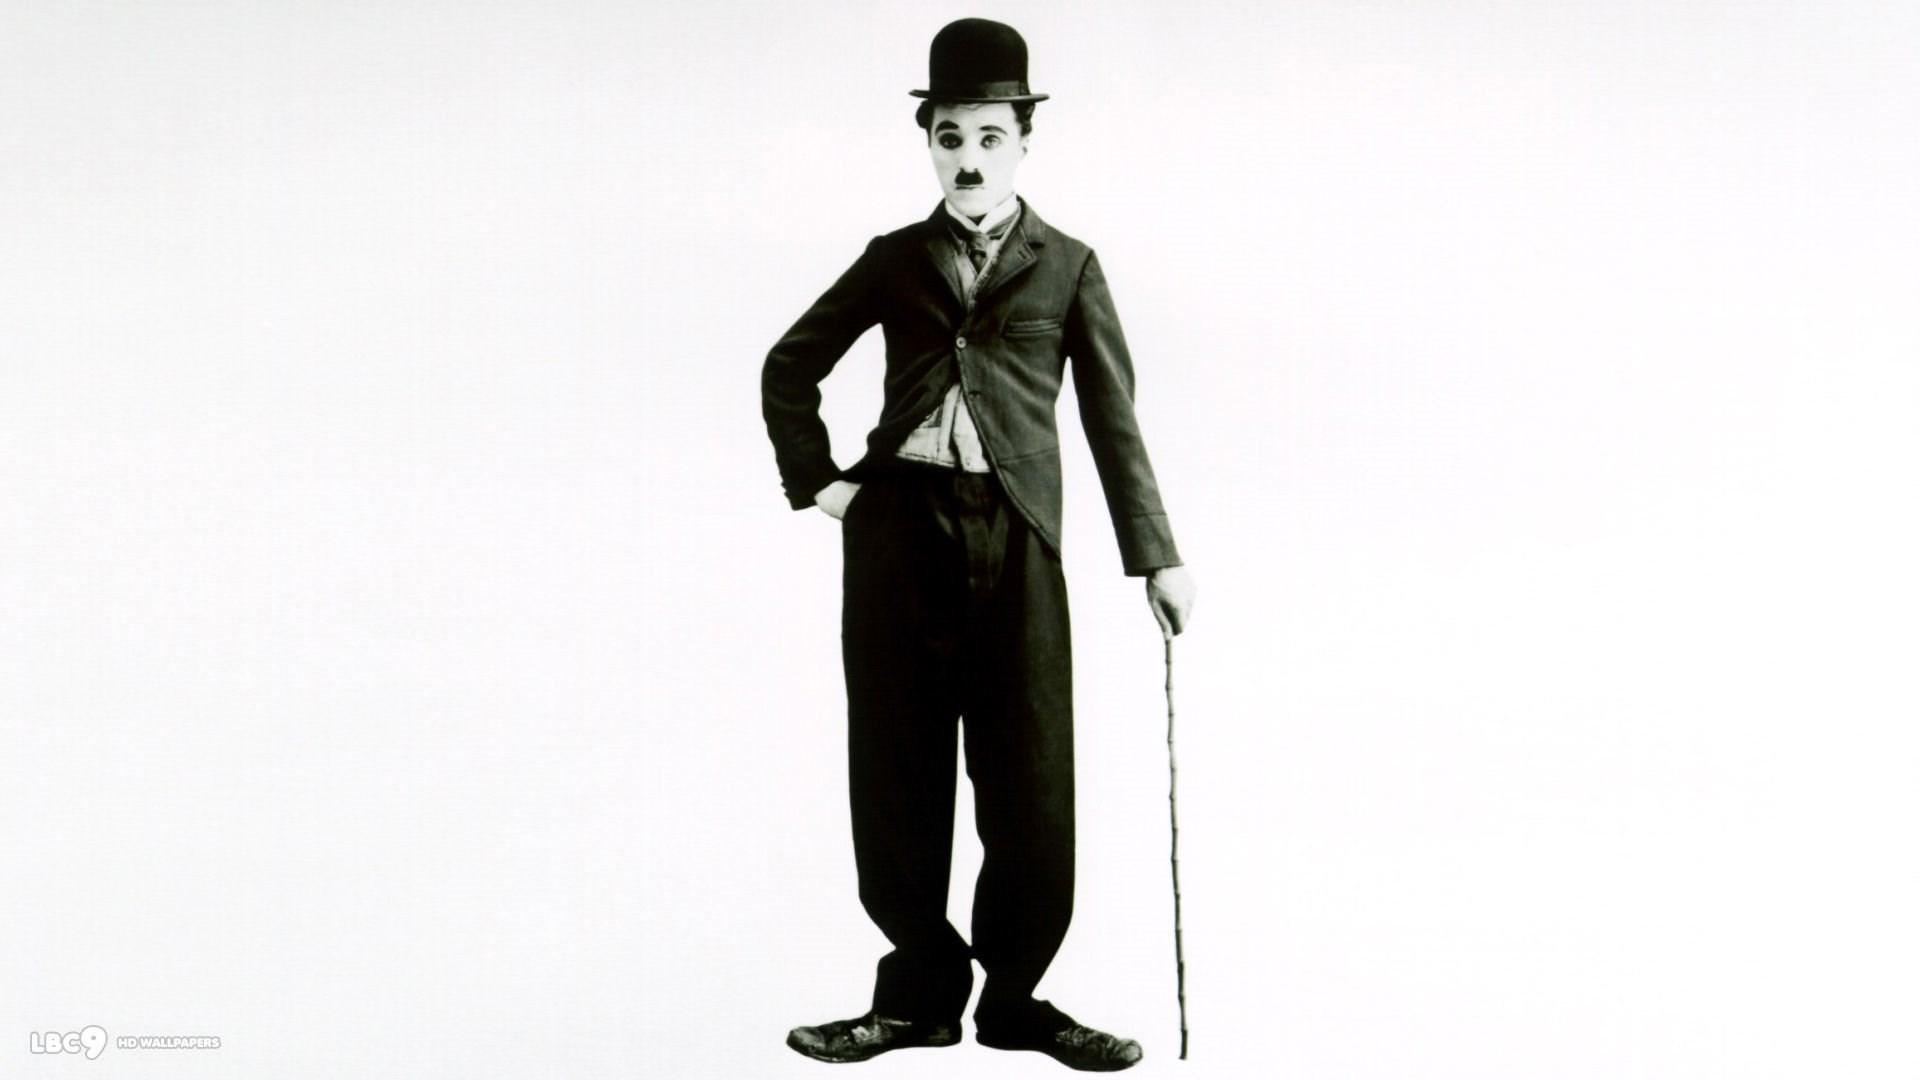 Charlie Chaplin Wallpapers 1/1 Desktop Background